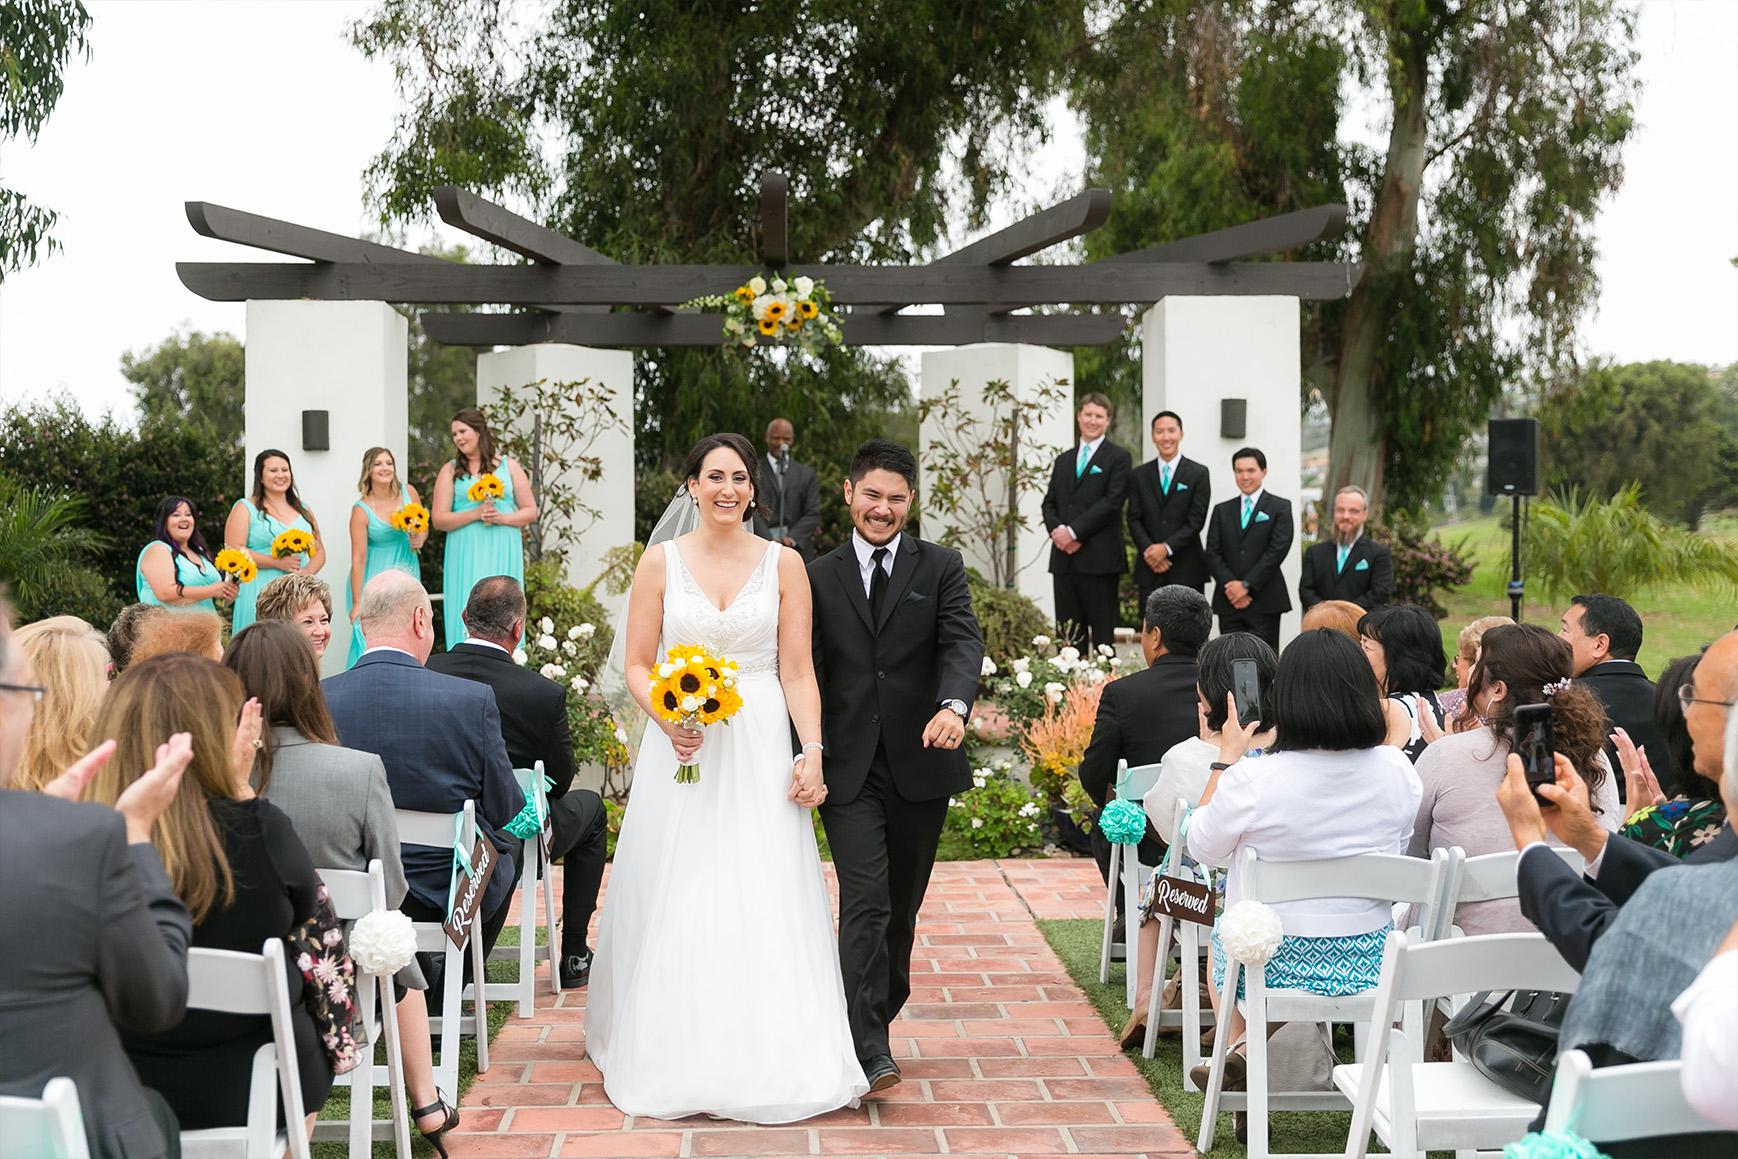 Wedding ceremony - San Clemente - San Clemente, California - Orange County - Wedgewood Weddings